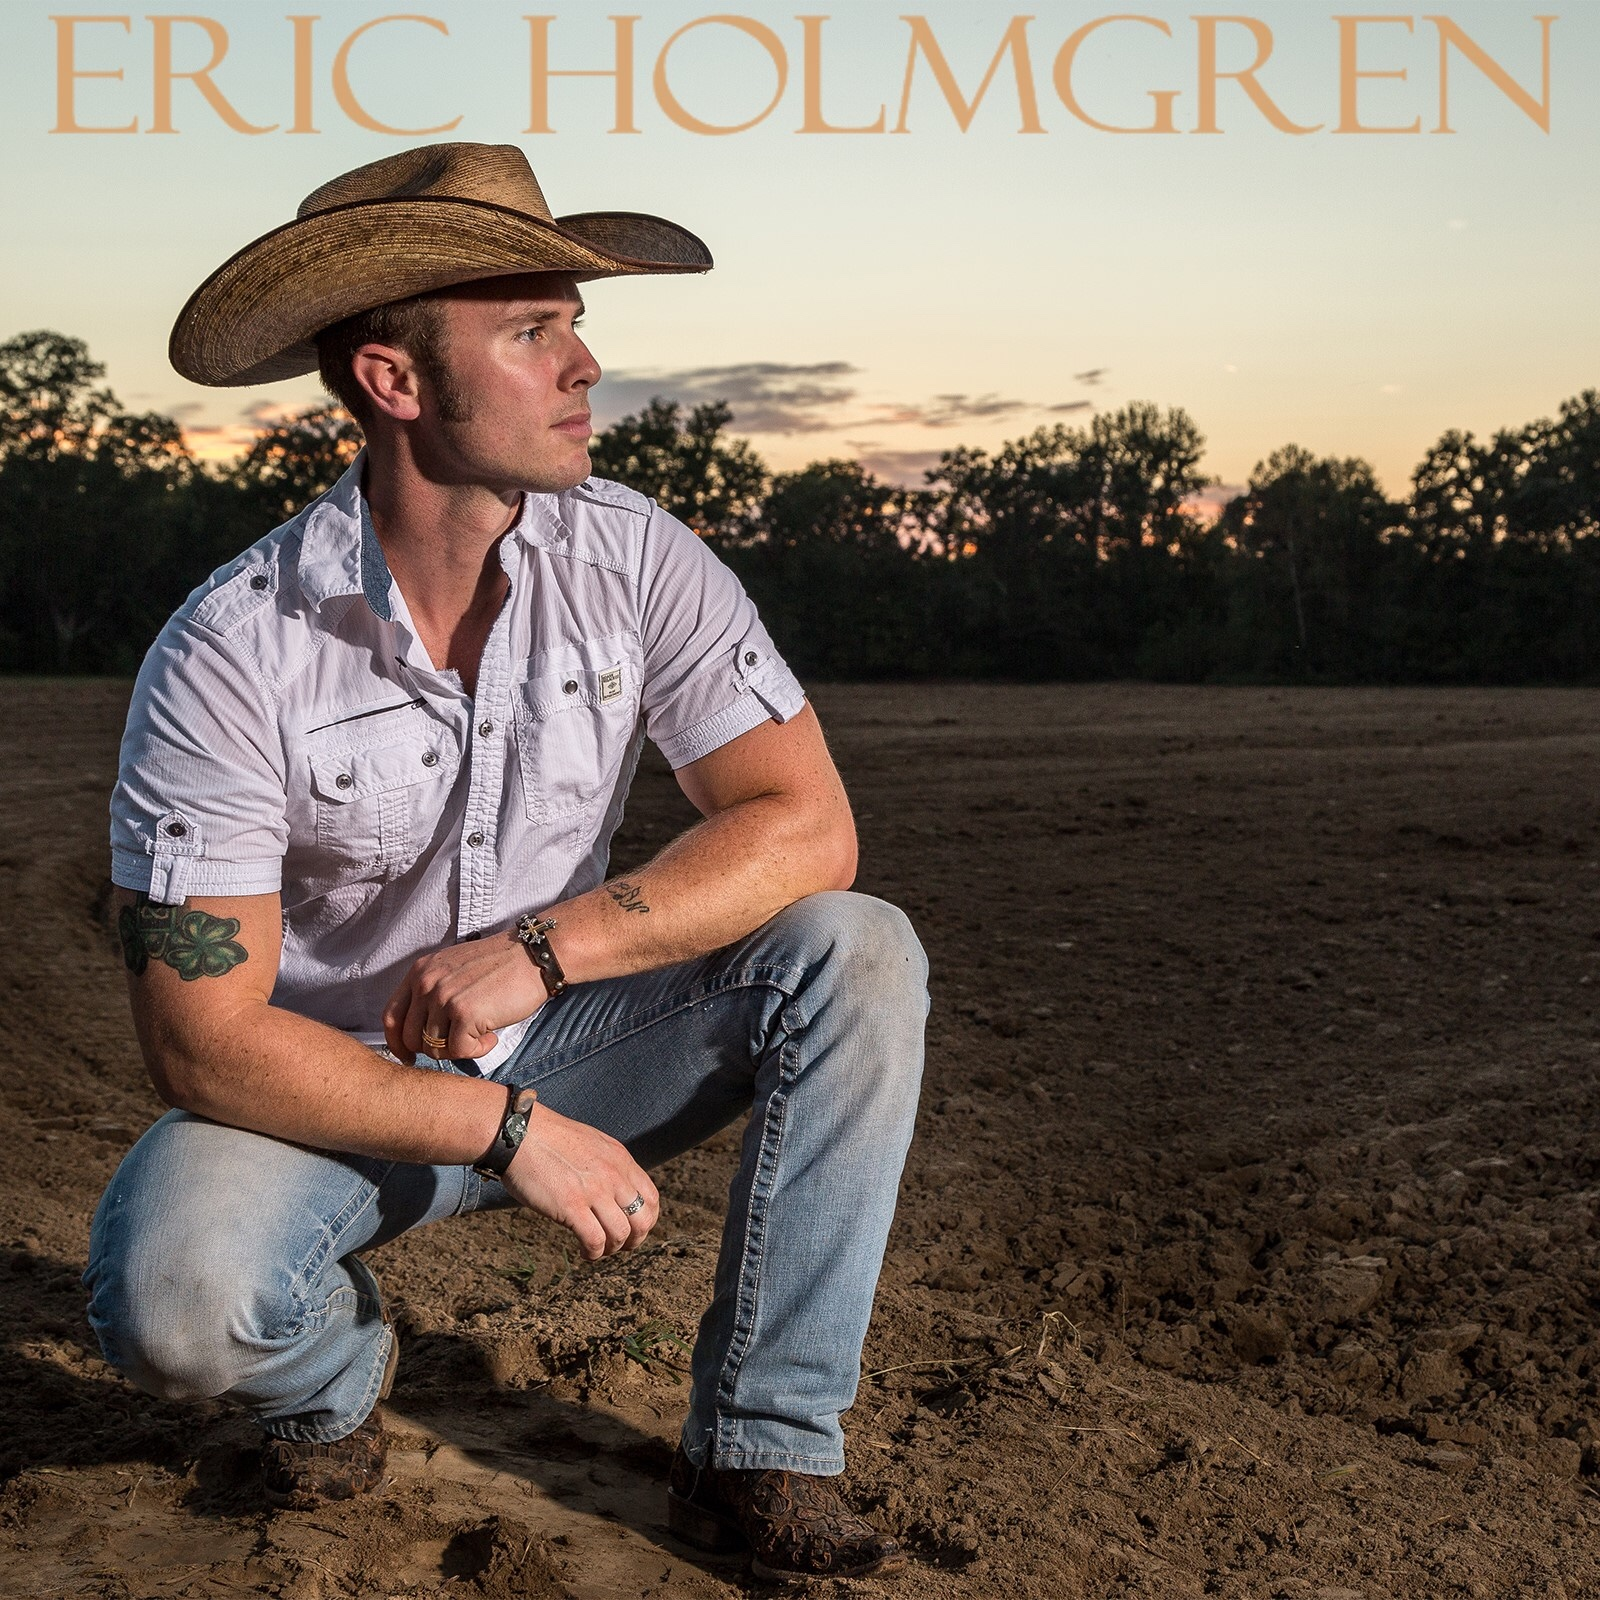 Eric Holmgren